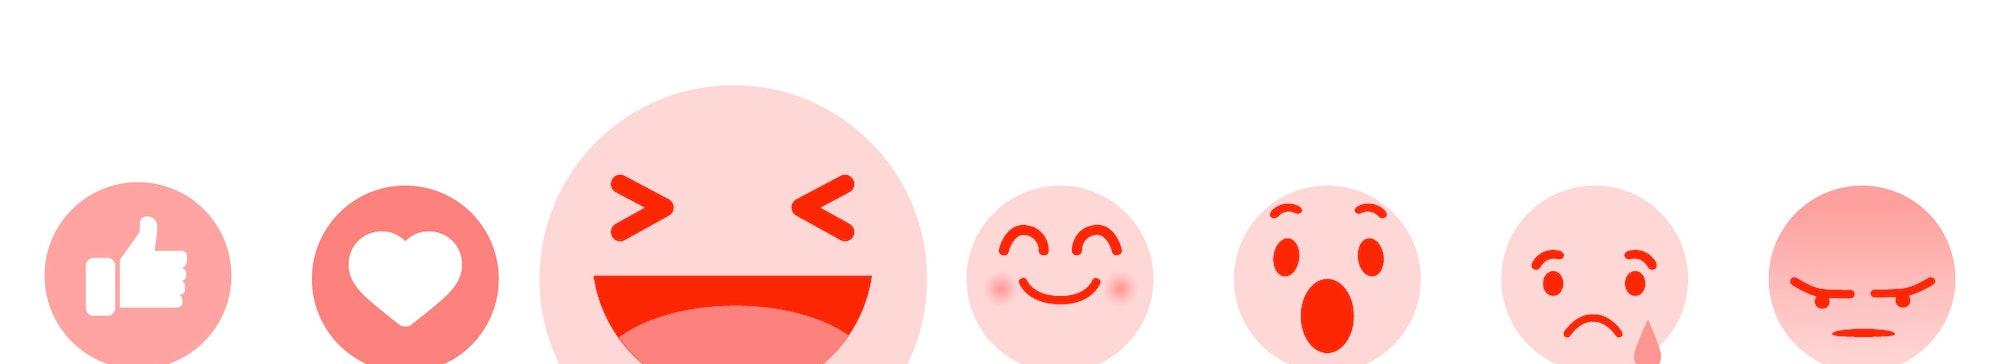 Modern Flat Design Vector Facebook Emoji Set with Different Reactions for Social Network. Vector illustration.